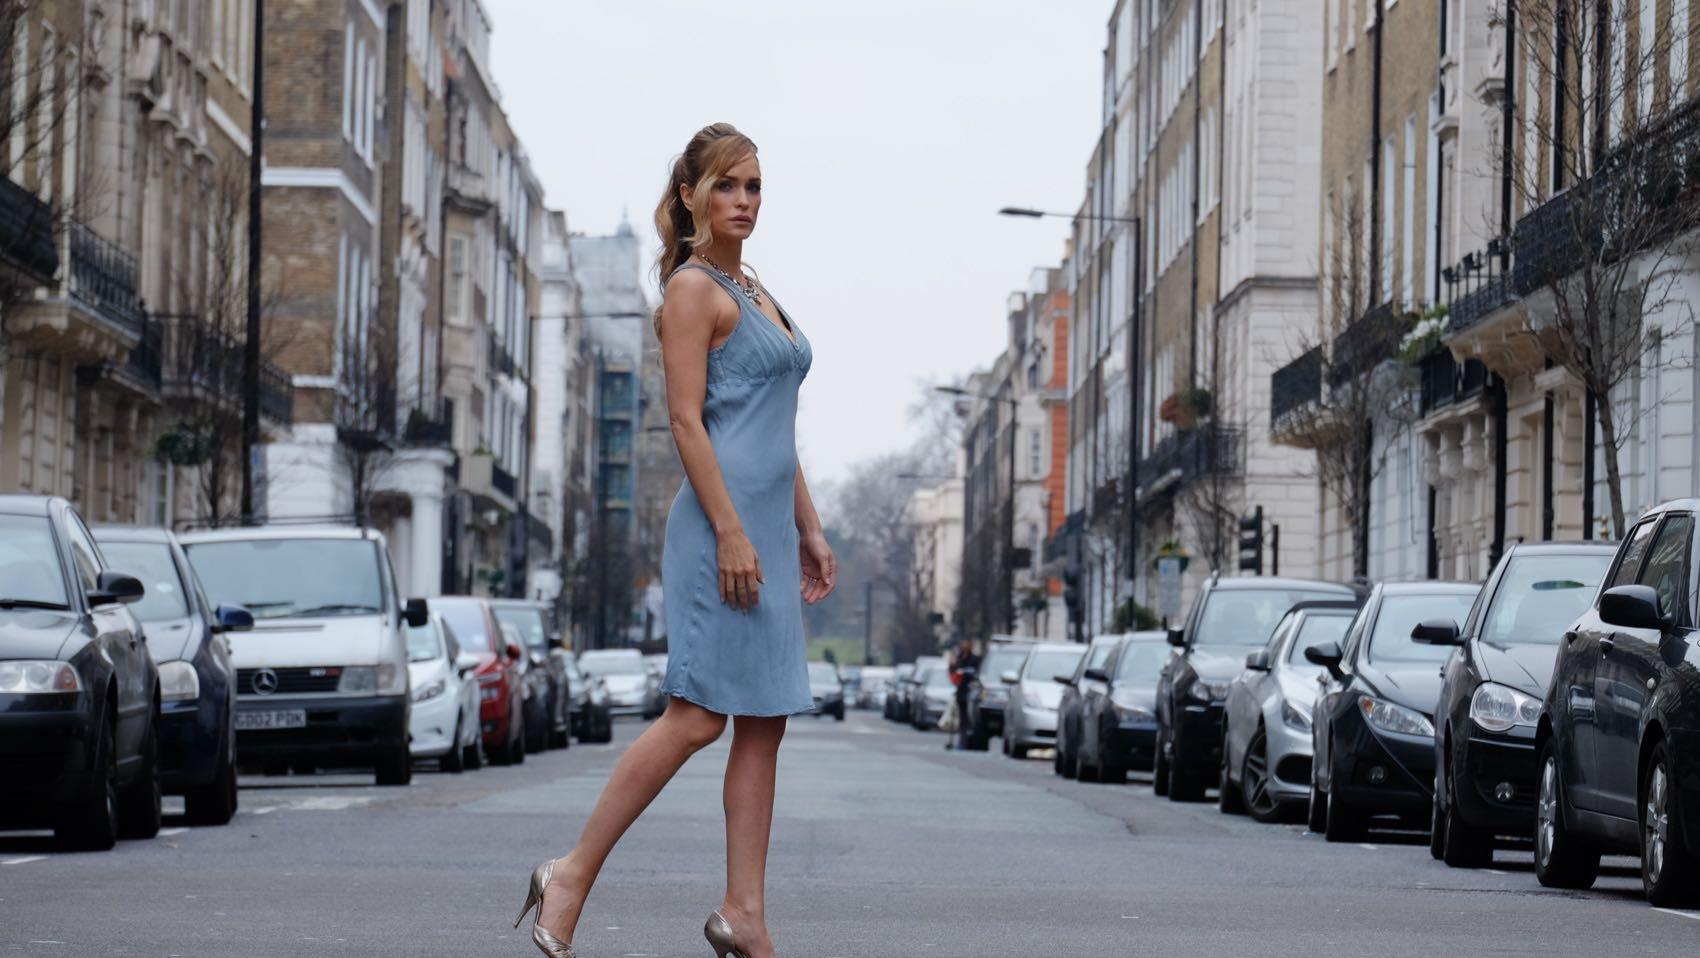 Model on of Harley Street London